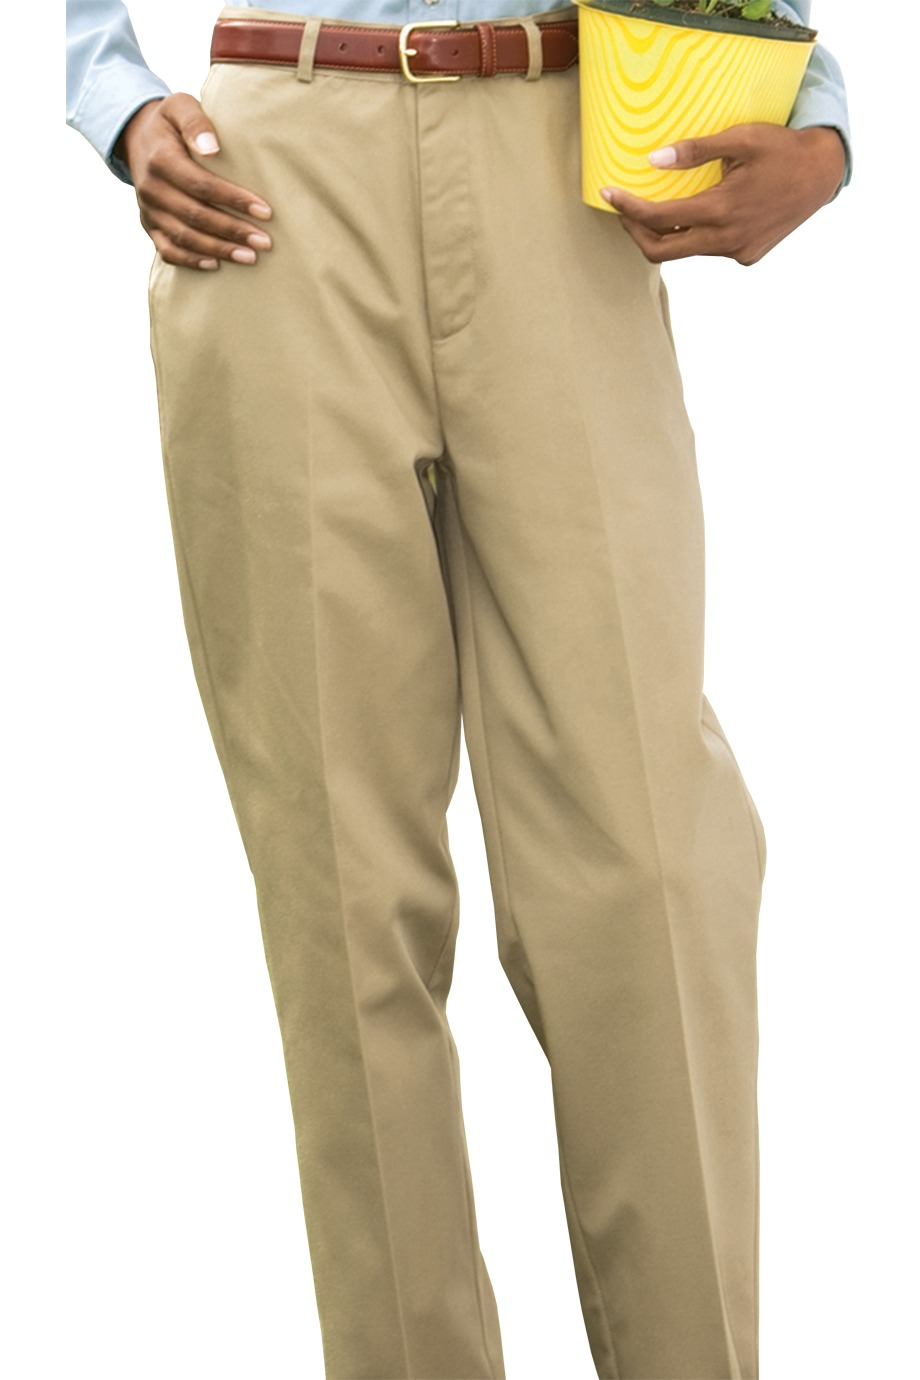 Edwards Garment 8567 - Women's Utility Flat Front Pant